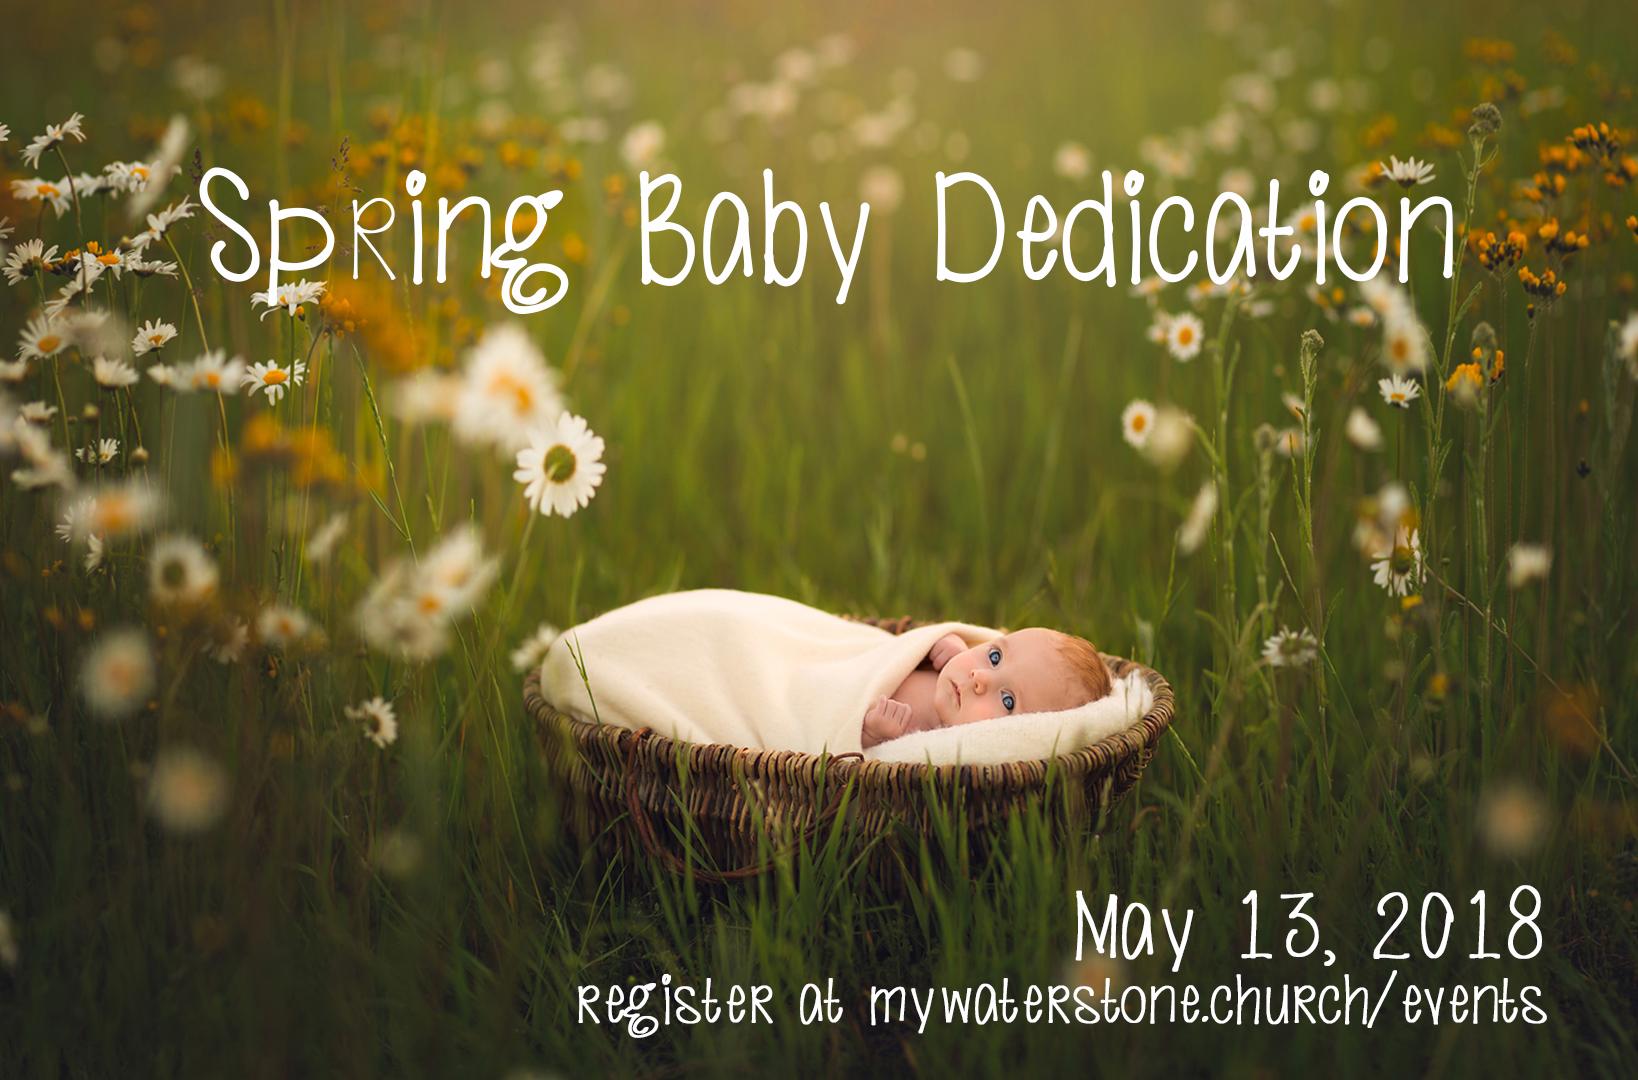 Spring baby dedication 2018 2